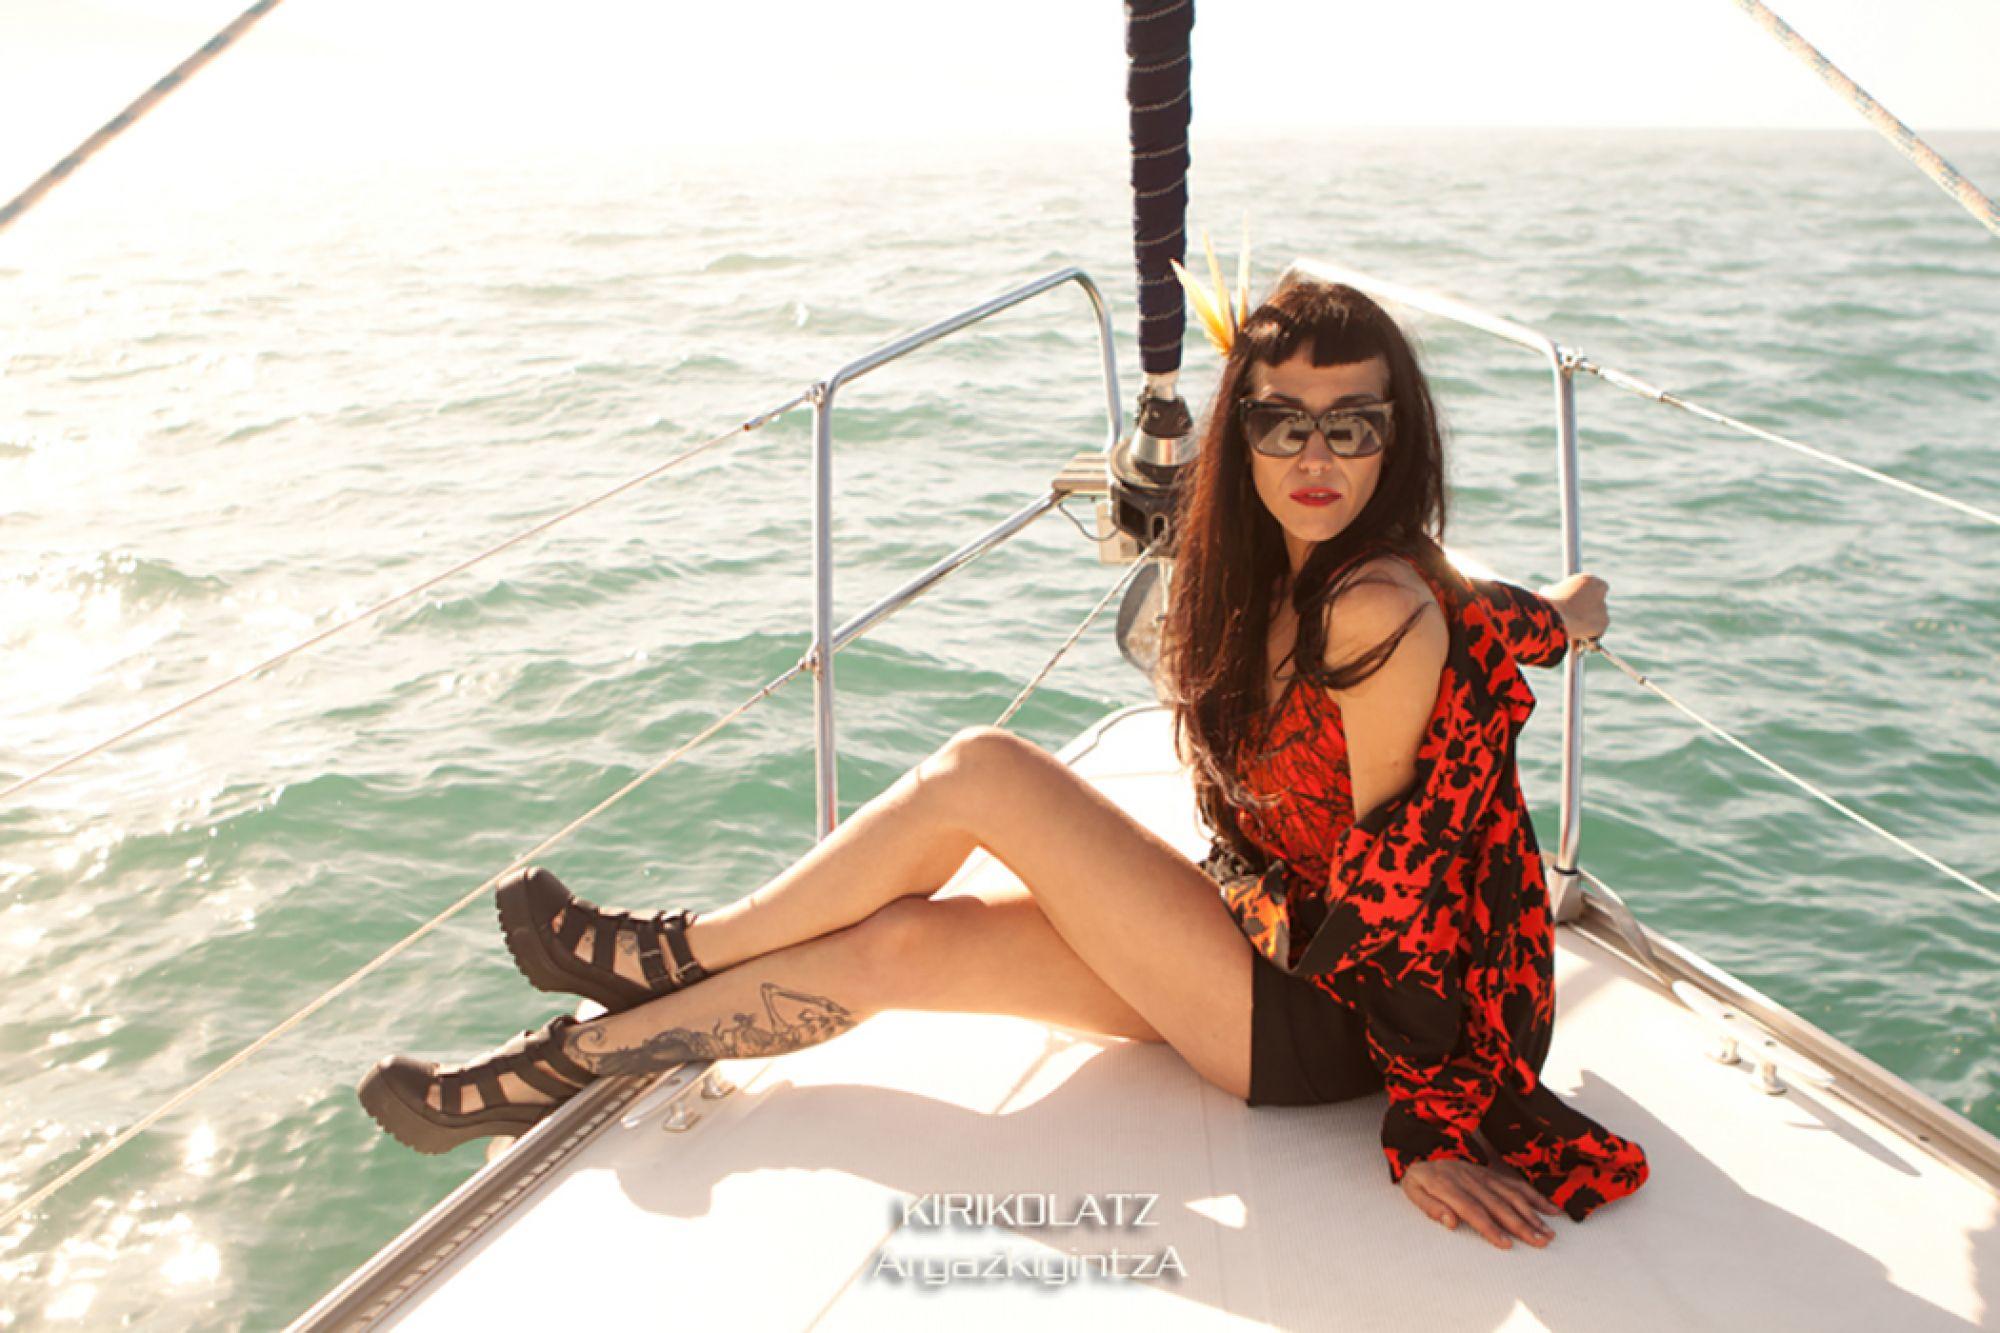 Fotos de Moda | Marcas de ropa Bermeo